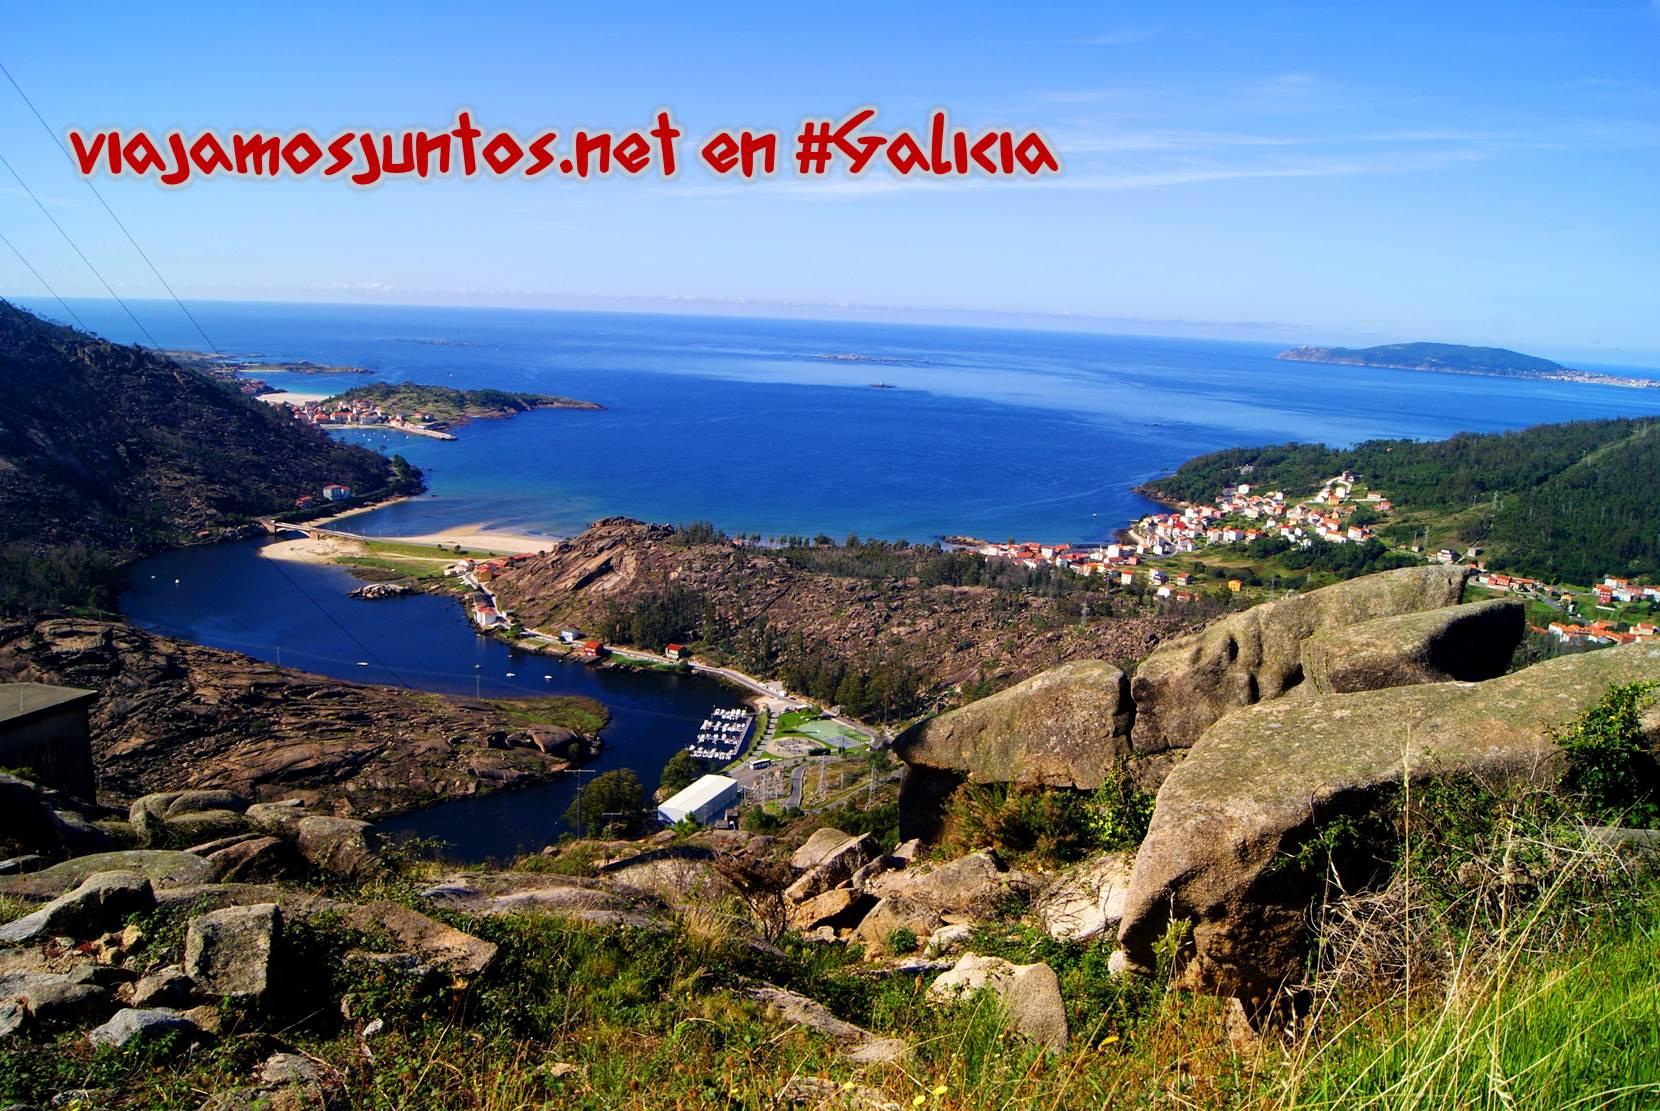 Mirador de Ézaro, Costa da Morte, Galicia; las vistas